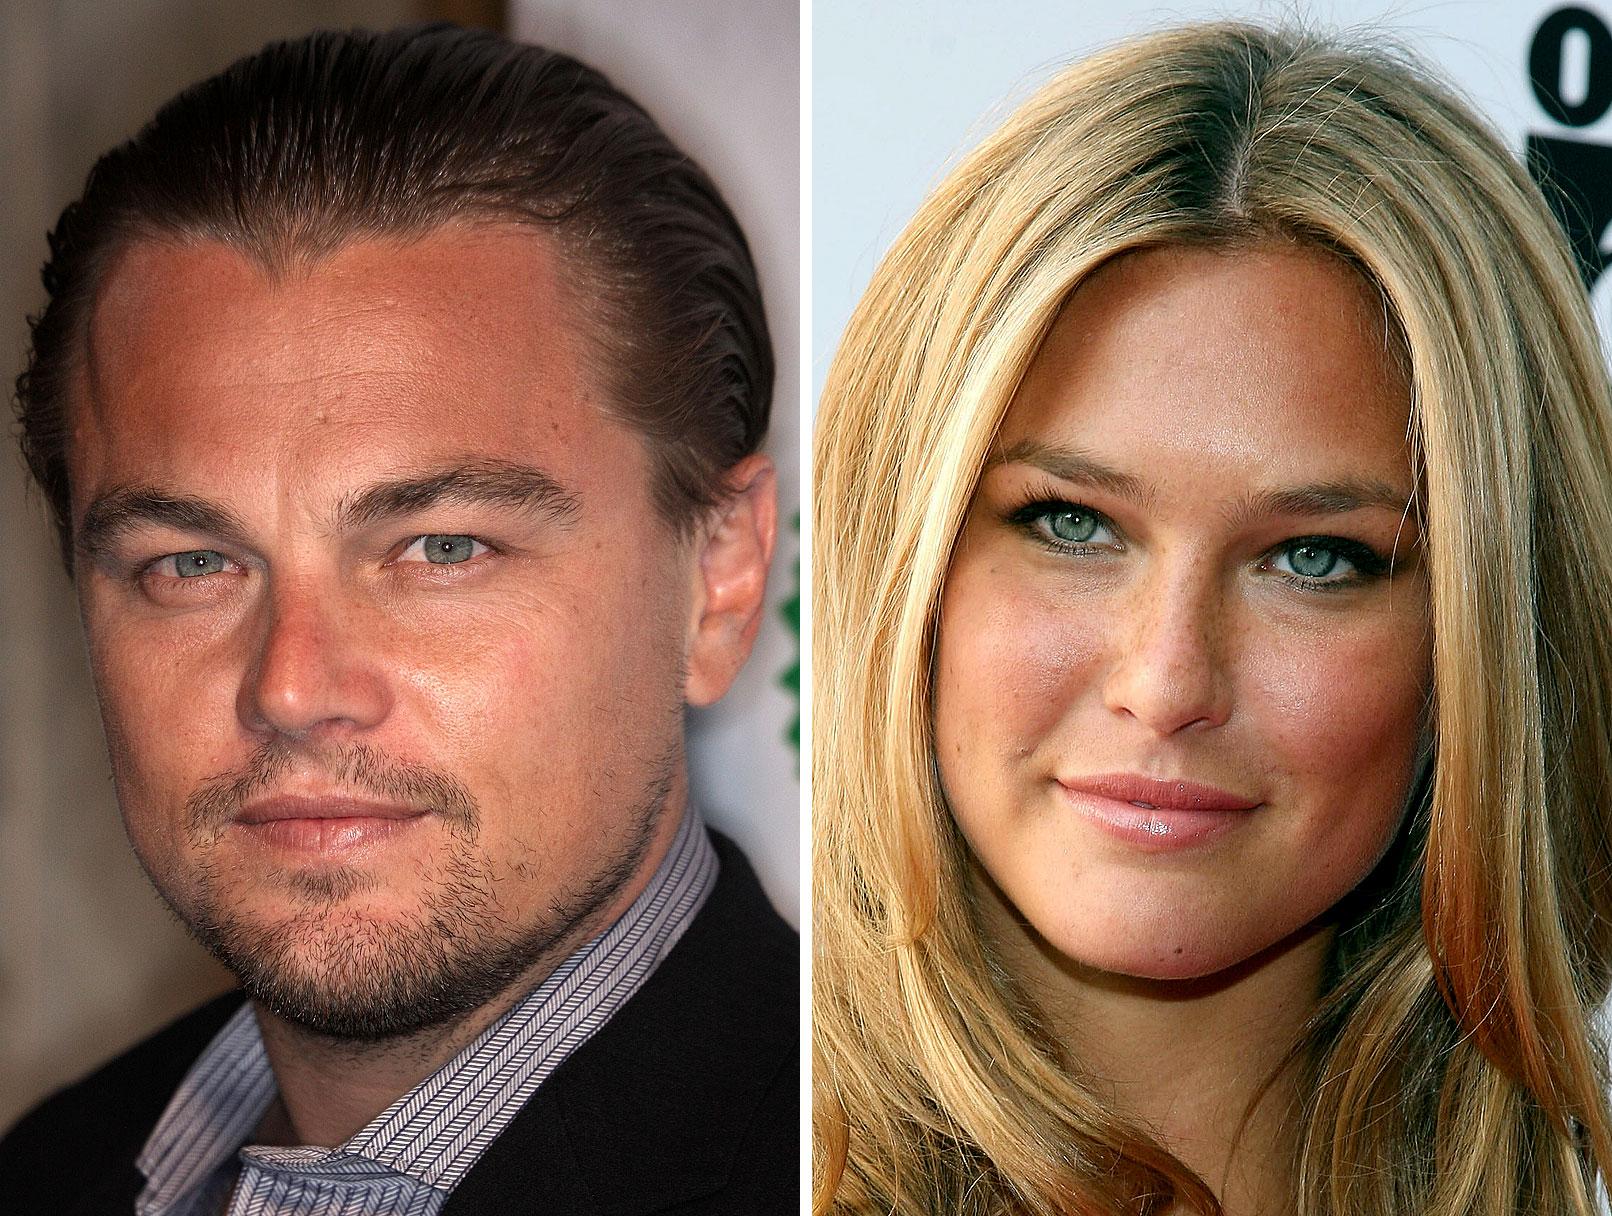 Leonardo DiCaprio and Bar Refaeli: Broken Up, or What?